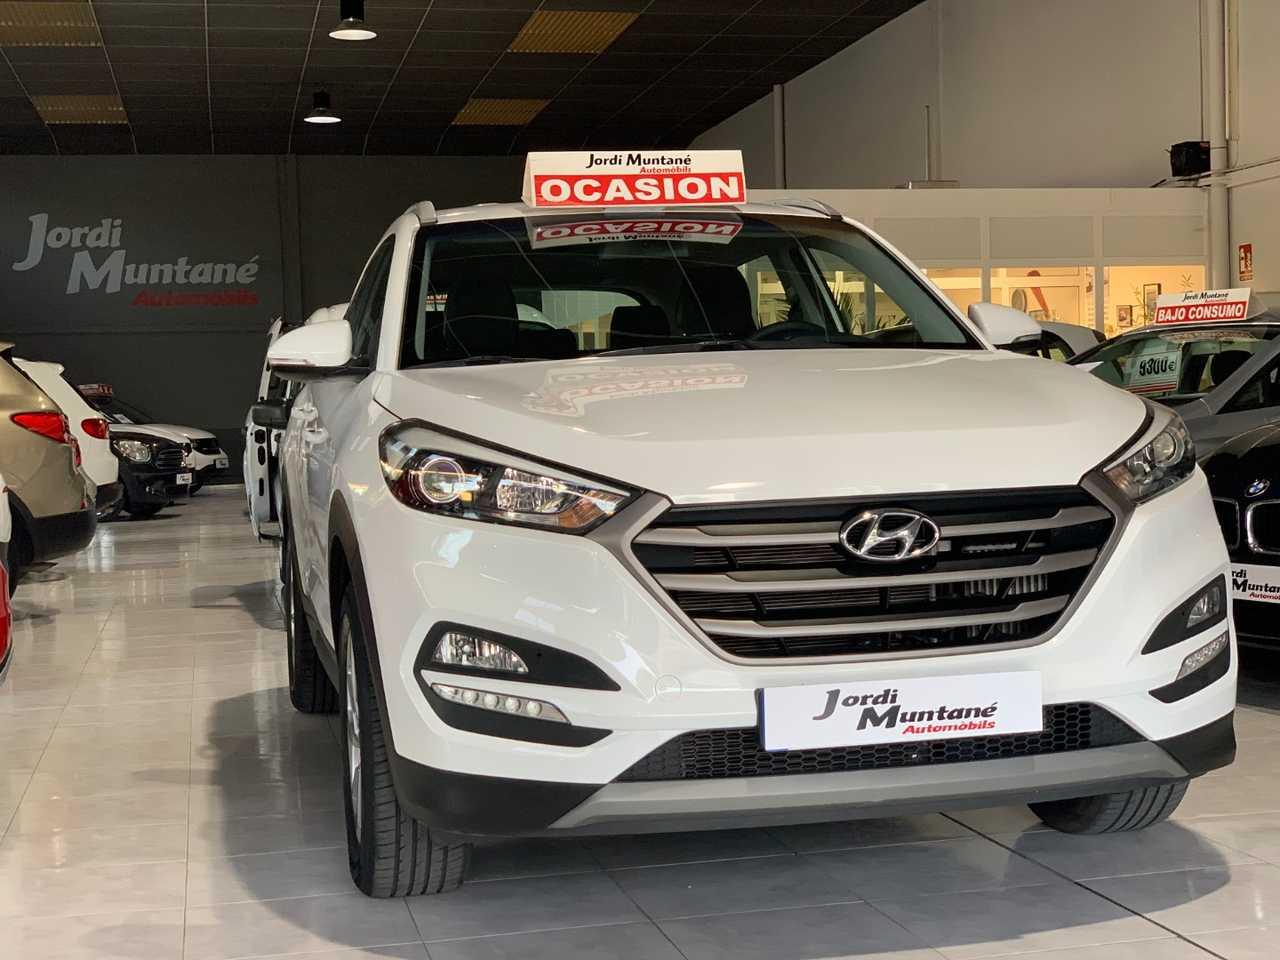 Hyundai Tucson 1.7 CRDI 115cv -. '' Solo 36.624 km '' .- 25 Aniversario -.   - Foto 1